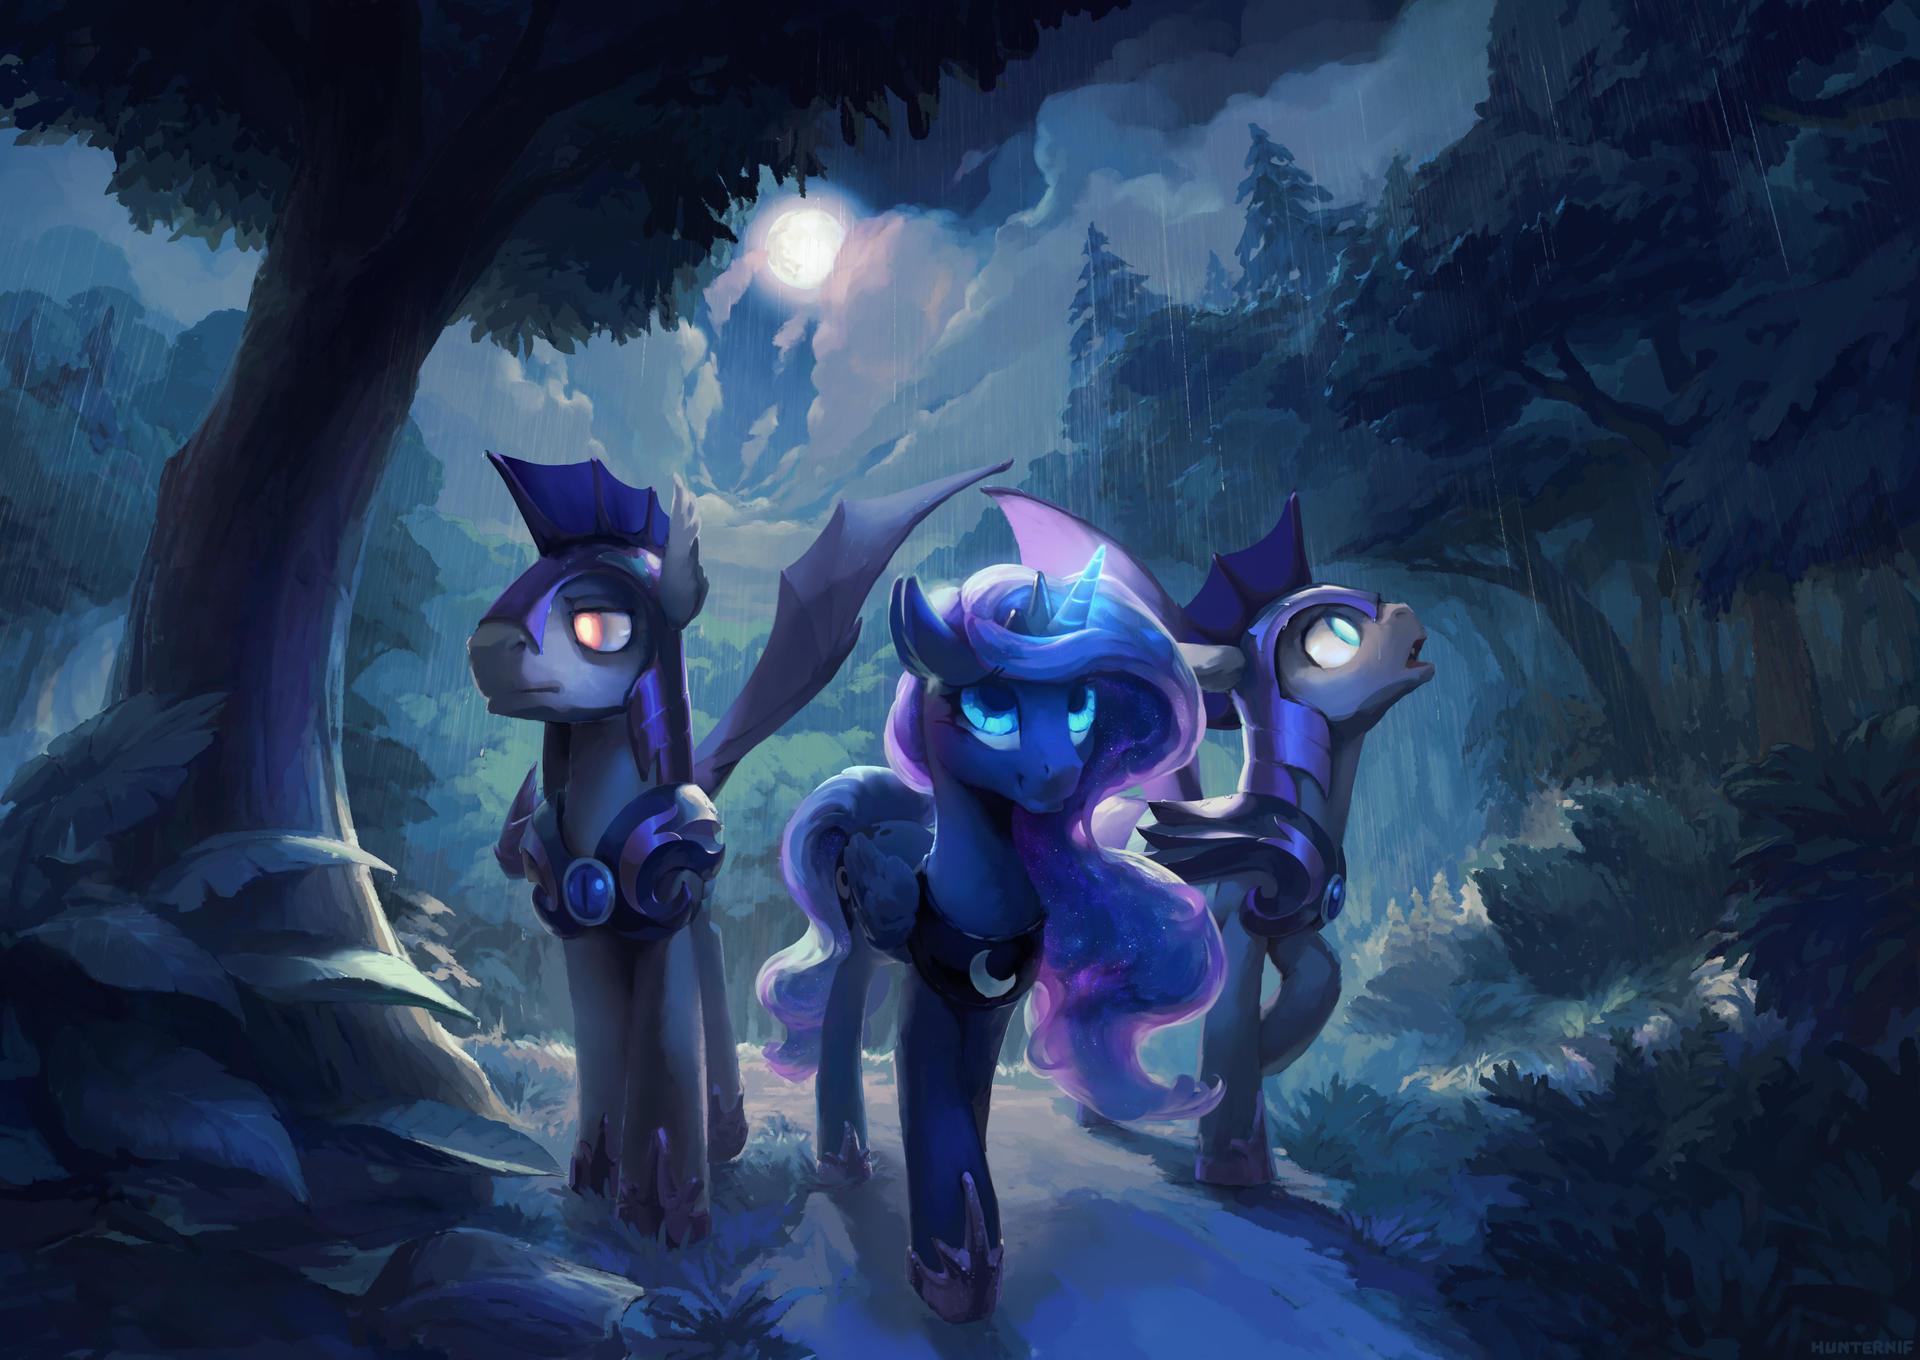 night_patrol_by_hunternif_ddaimd8-fullvi